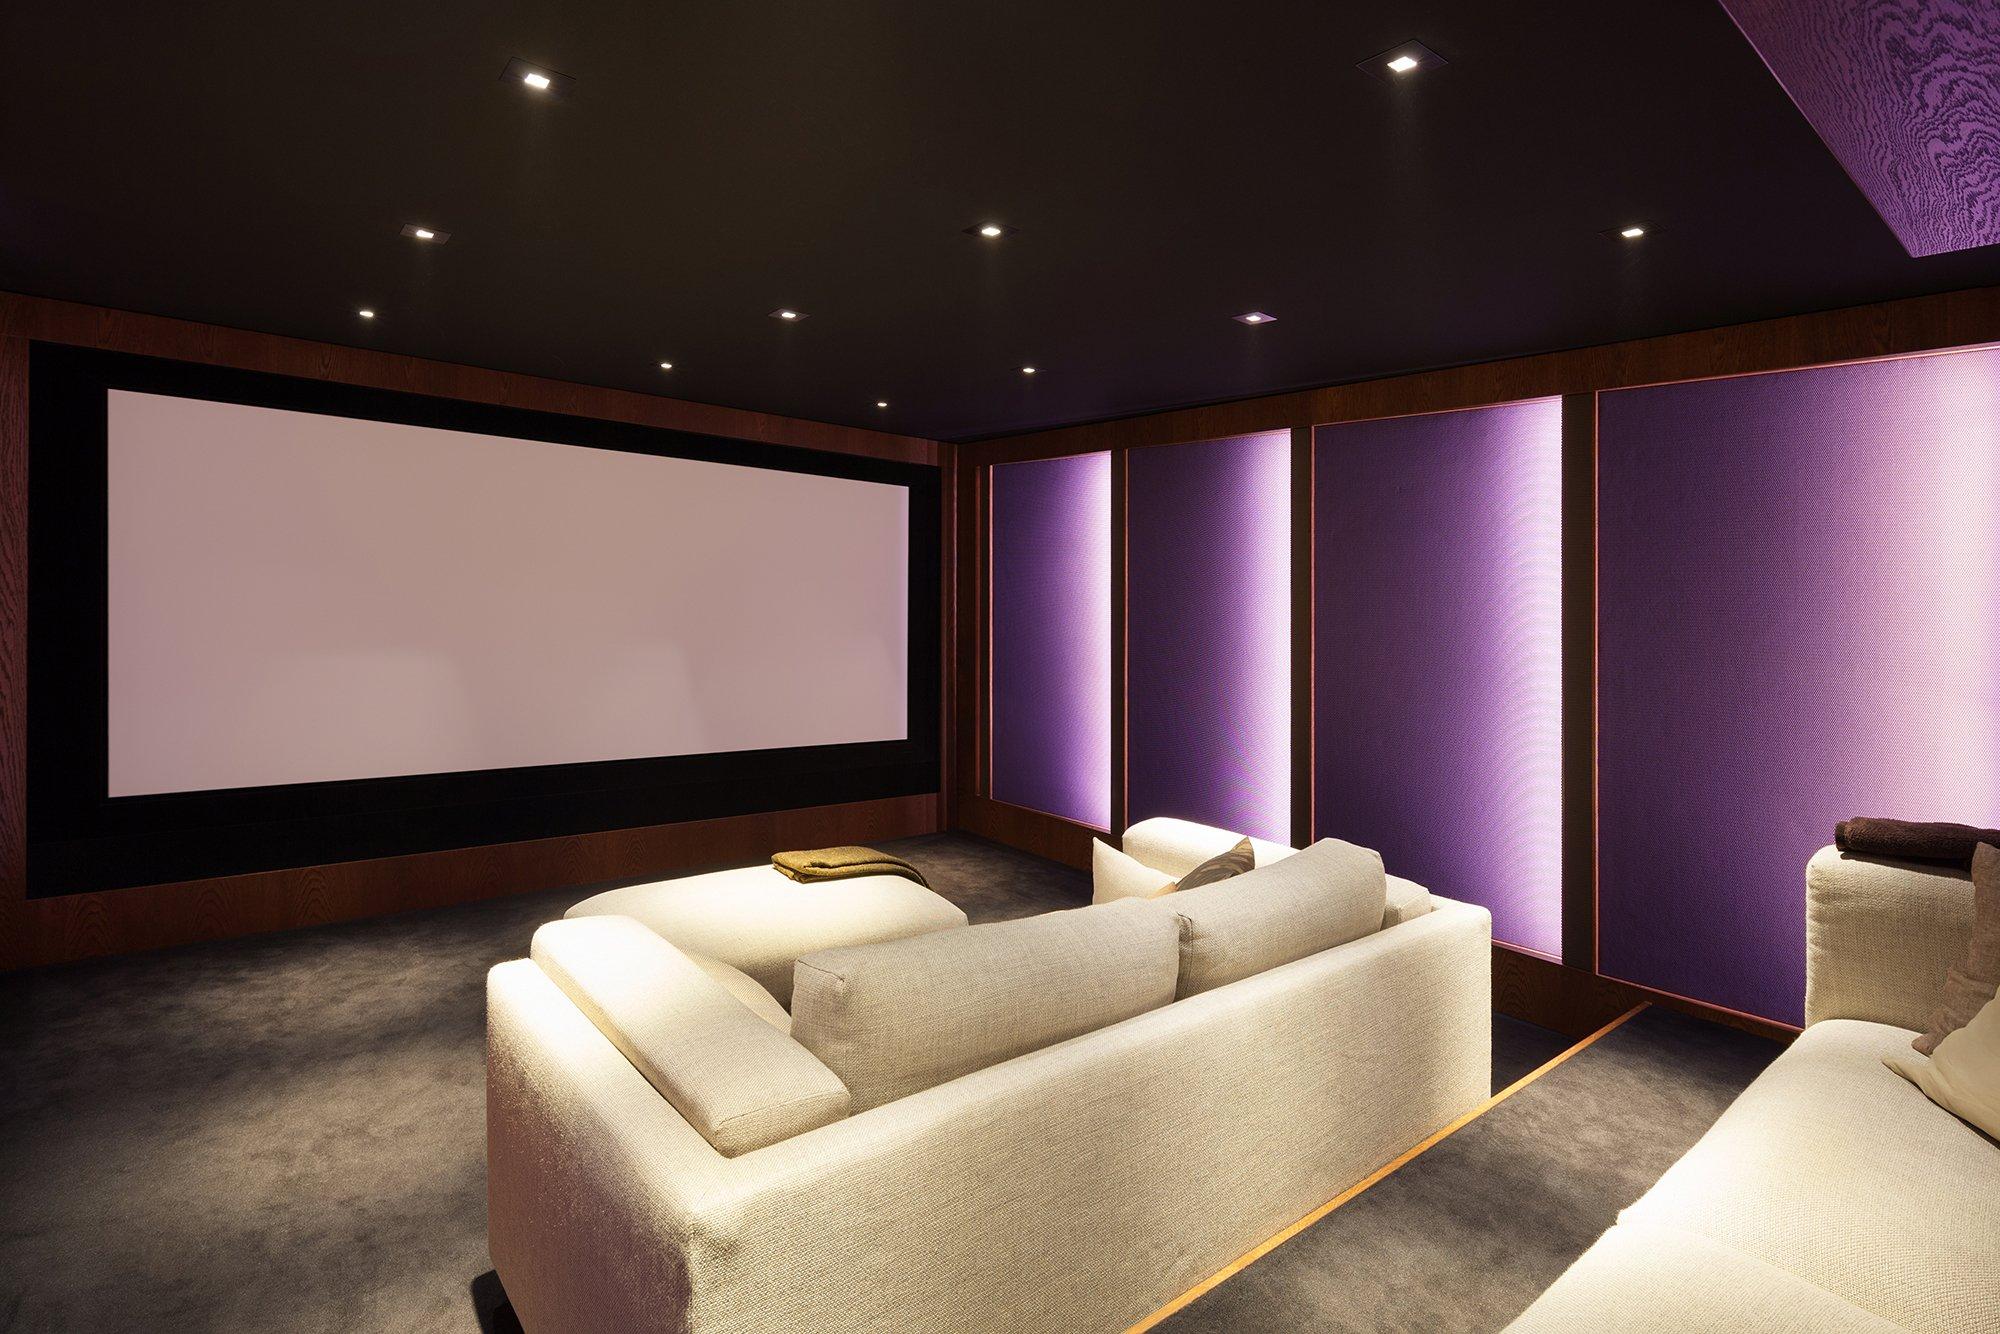 Home Cinema Installations in Gerrards Cross & London